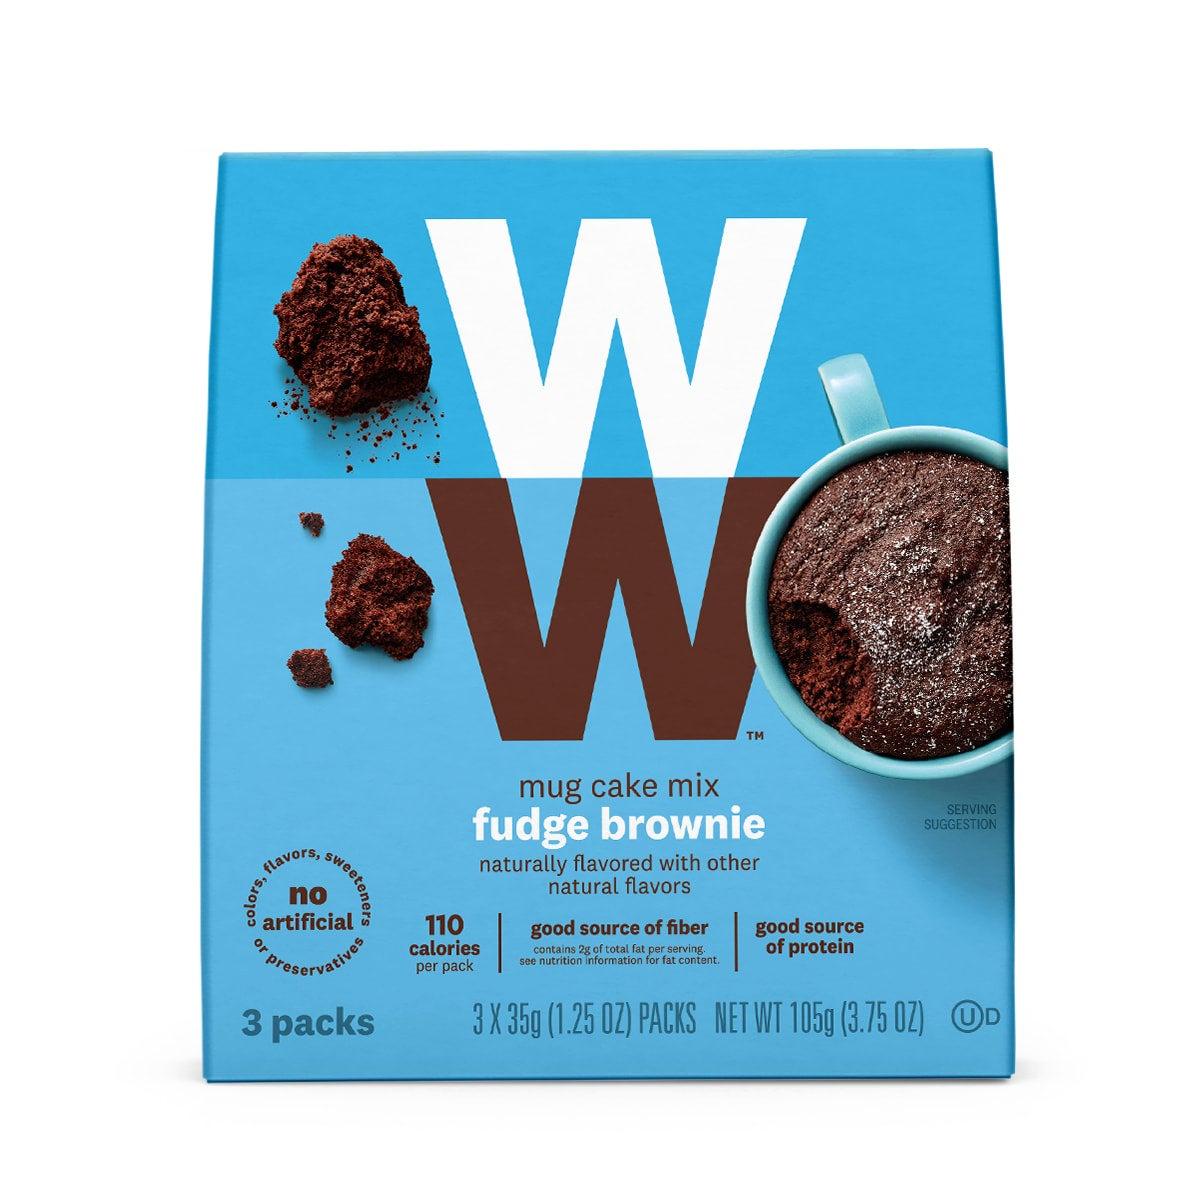 Fudge Brownie Mug Cake Mix, 110 calories, good source of protein, 3 pouches